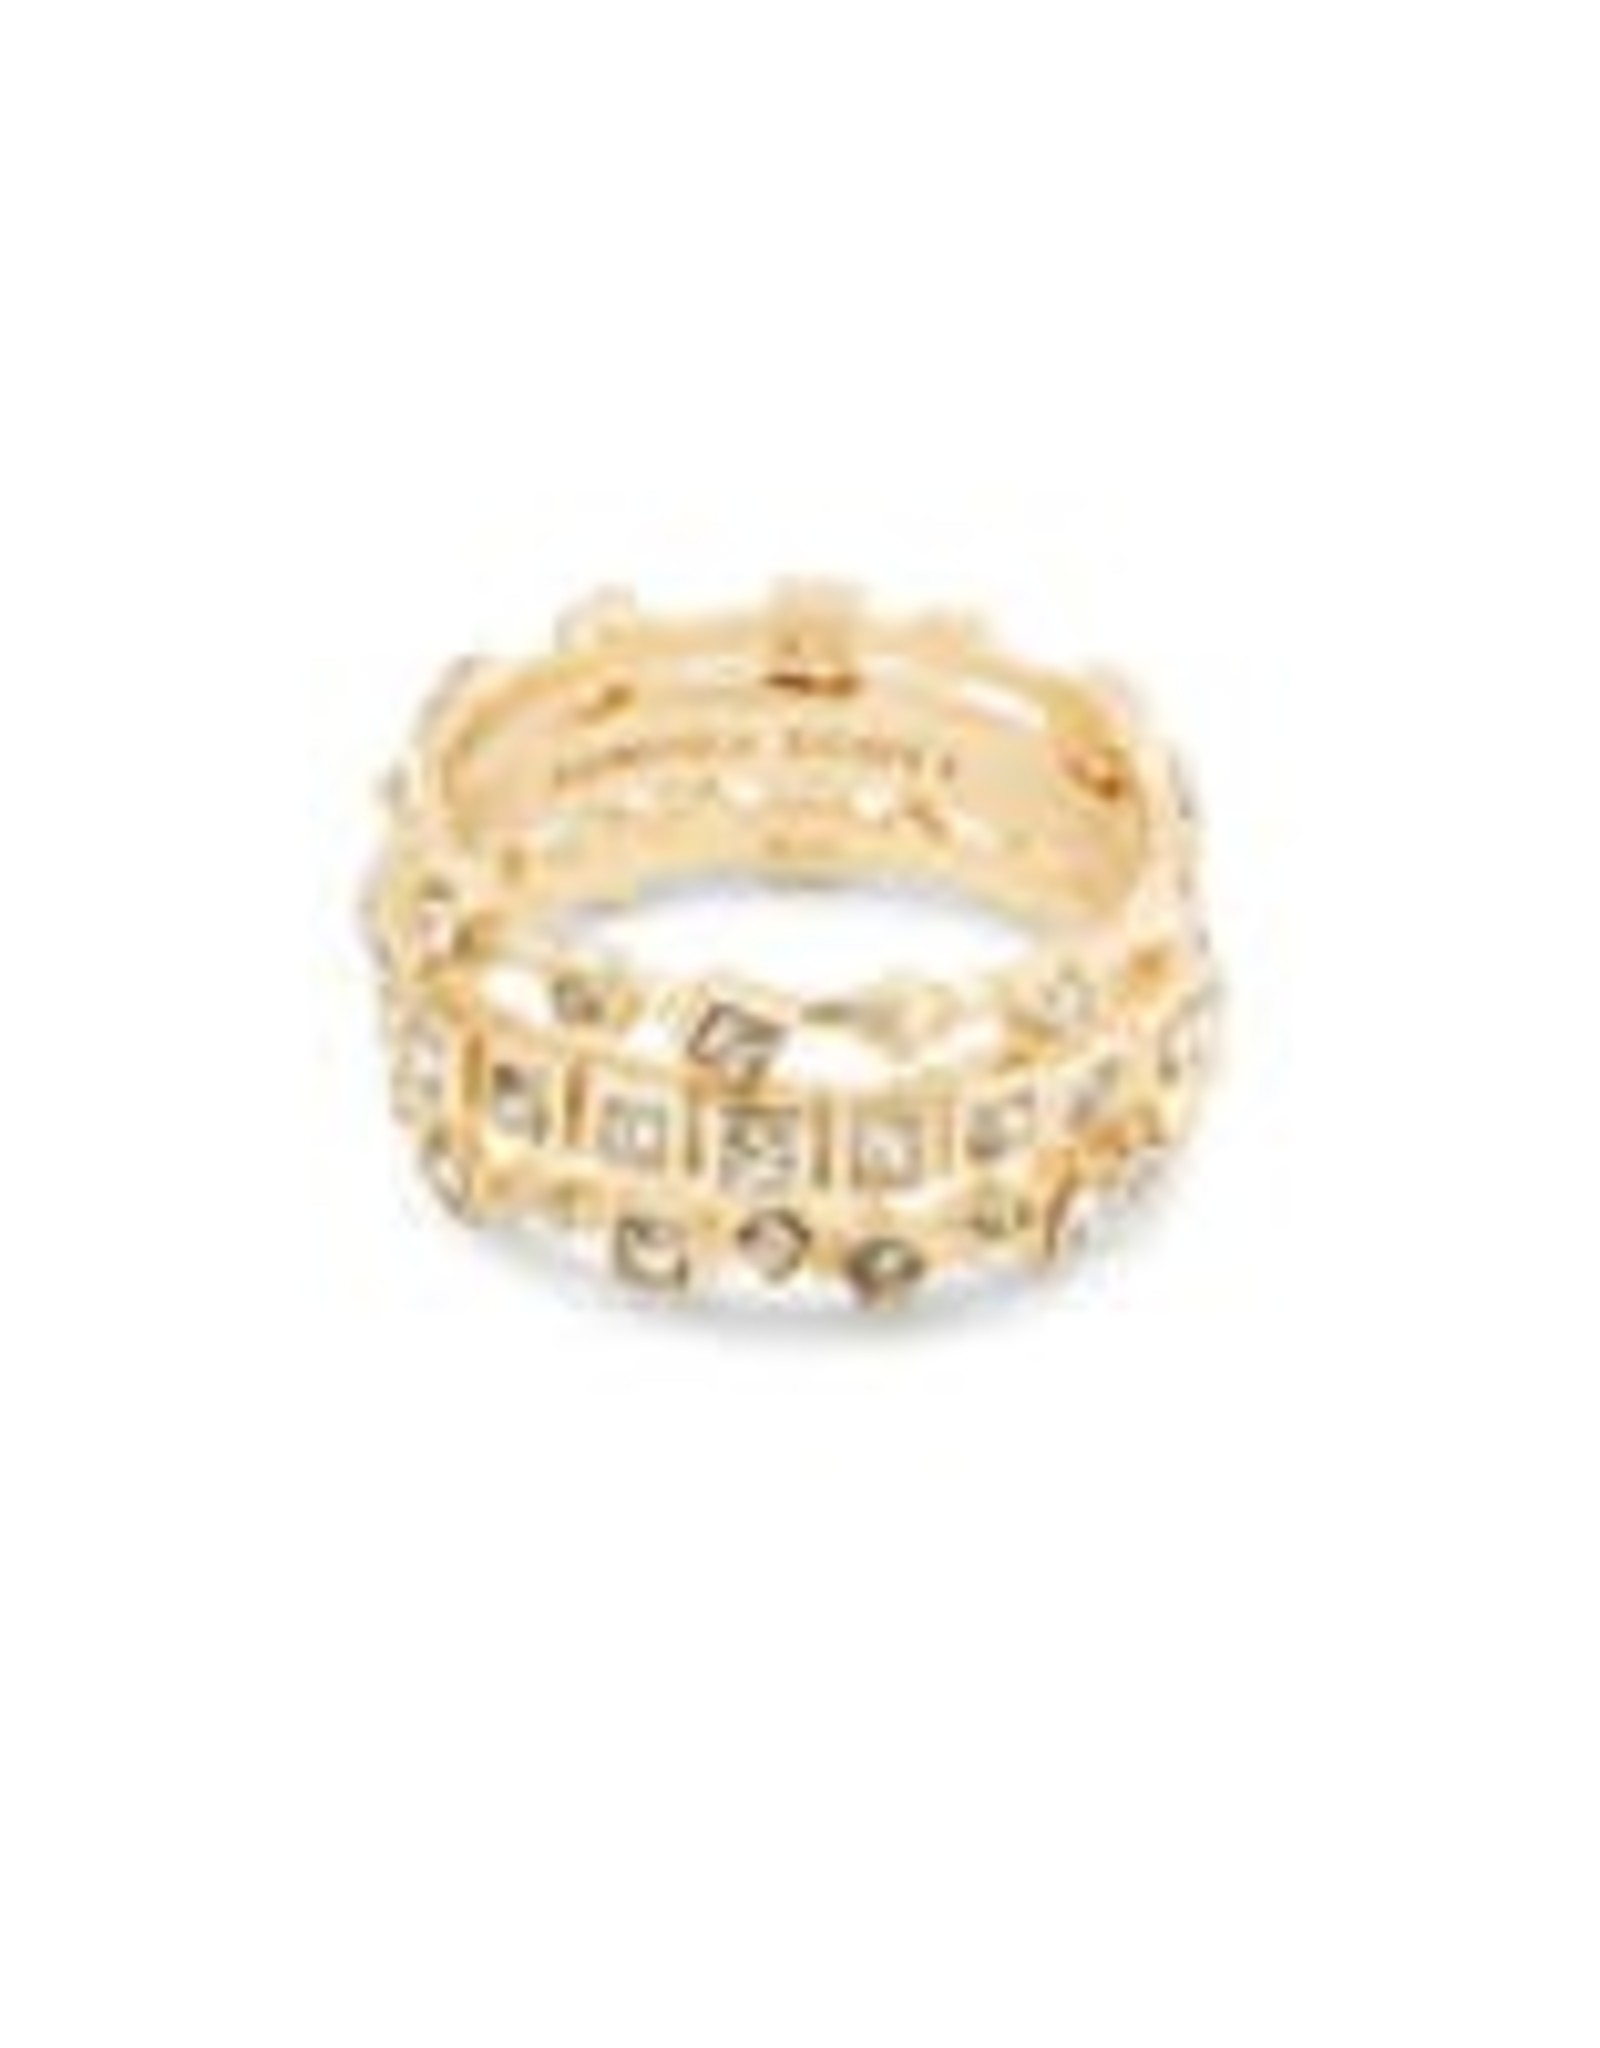 Kendra Scott Kendra Scott Karis Stackable Ring